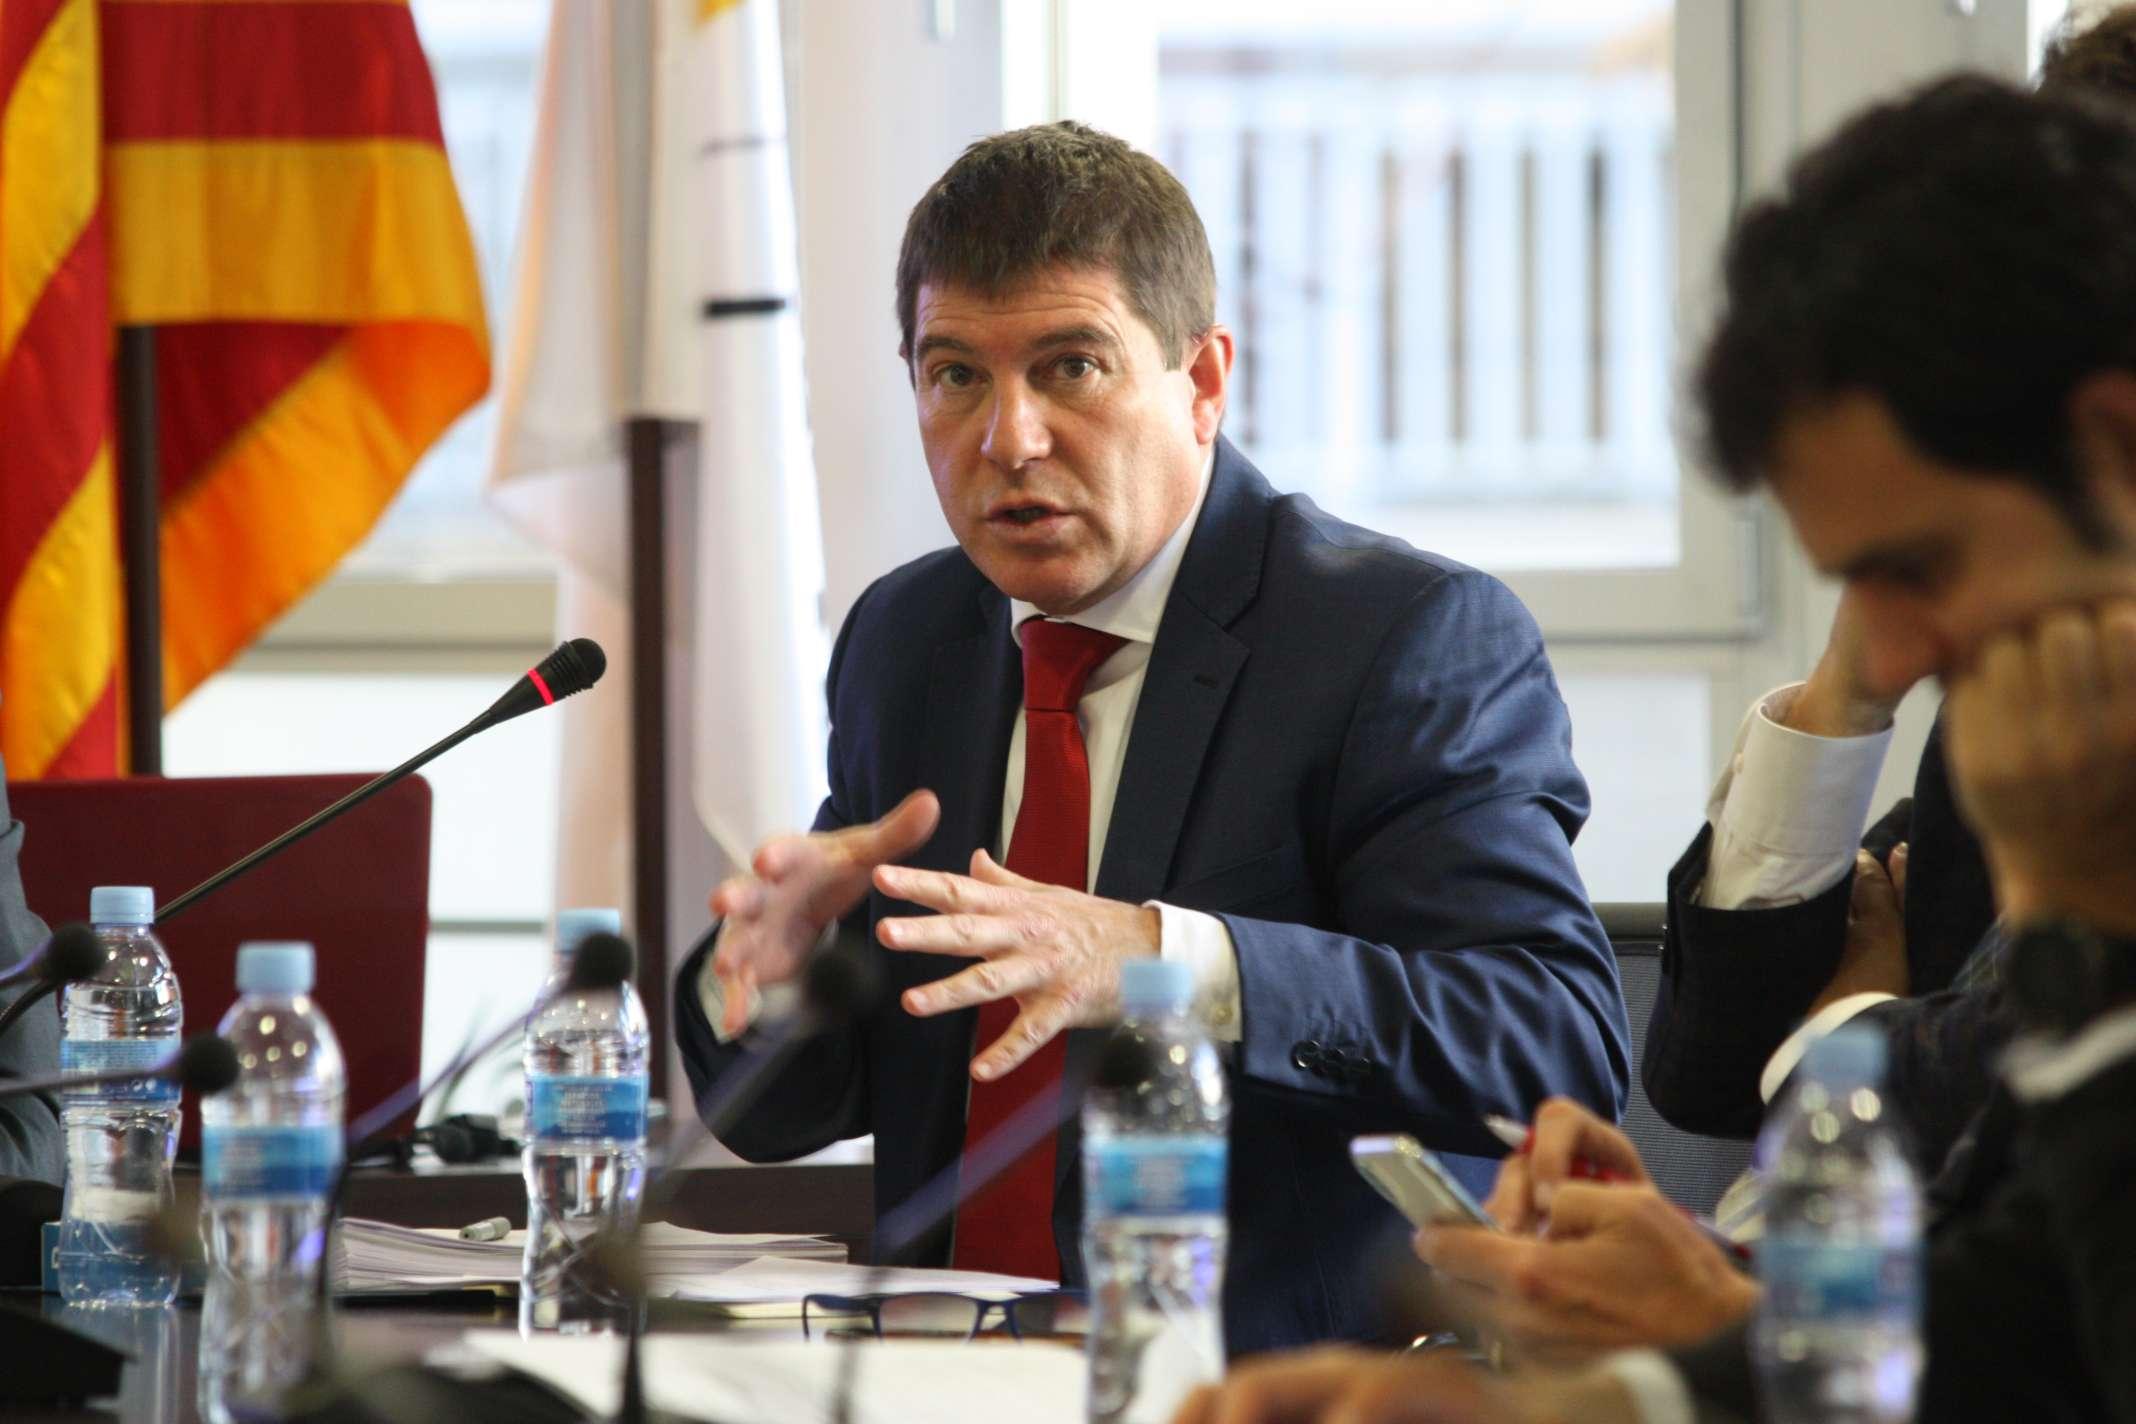 En la trobada s'ha presentat el coordinador territorial de la RFEF a Catalunya, Josep Ayuso